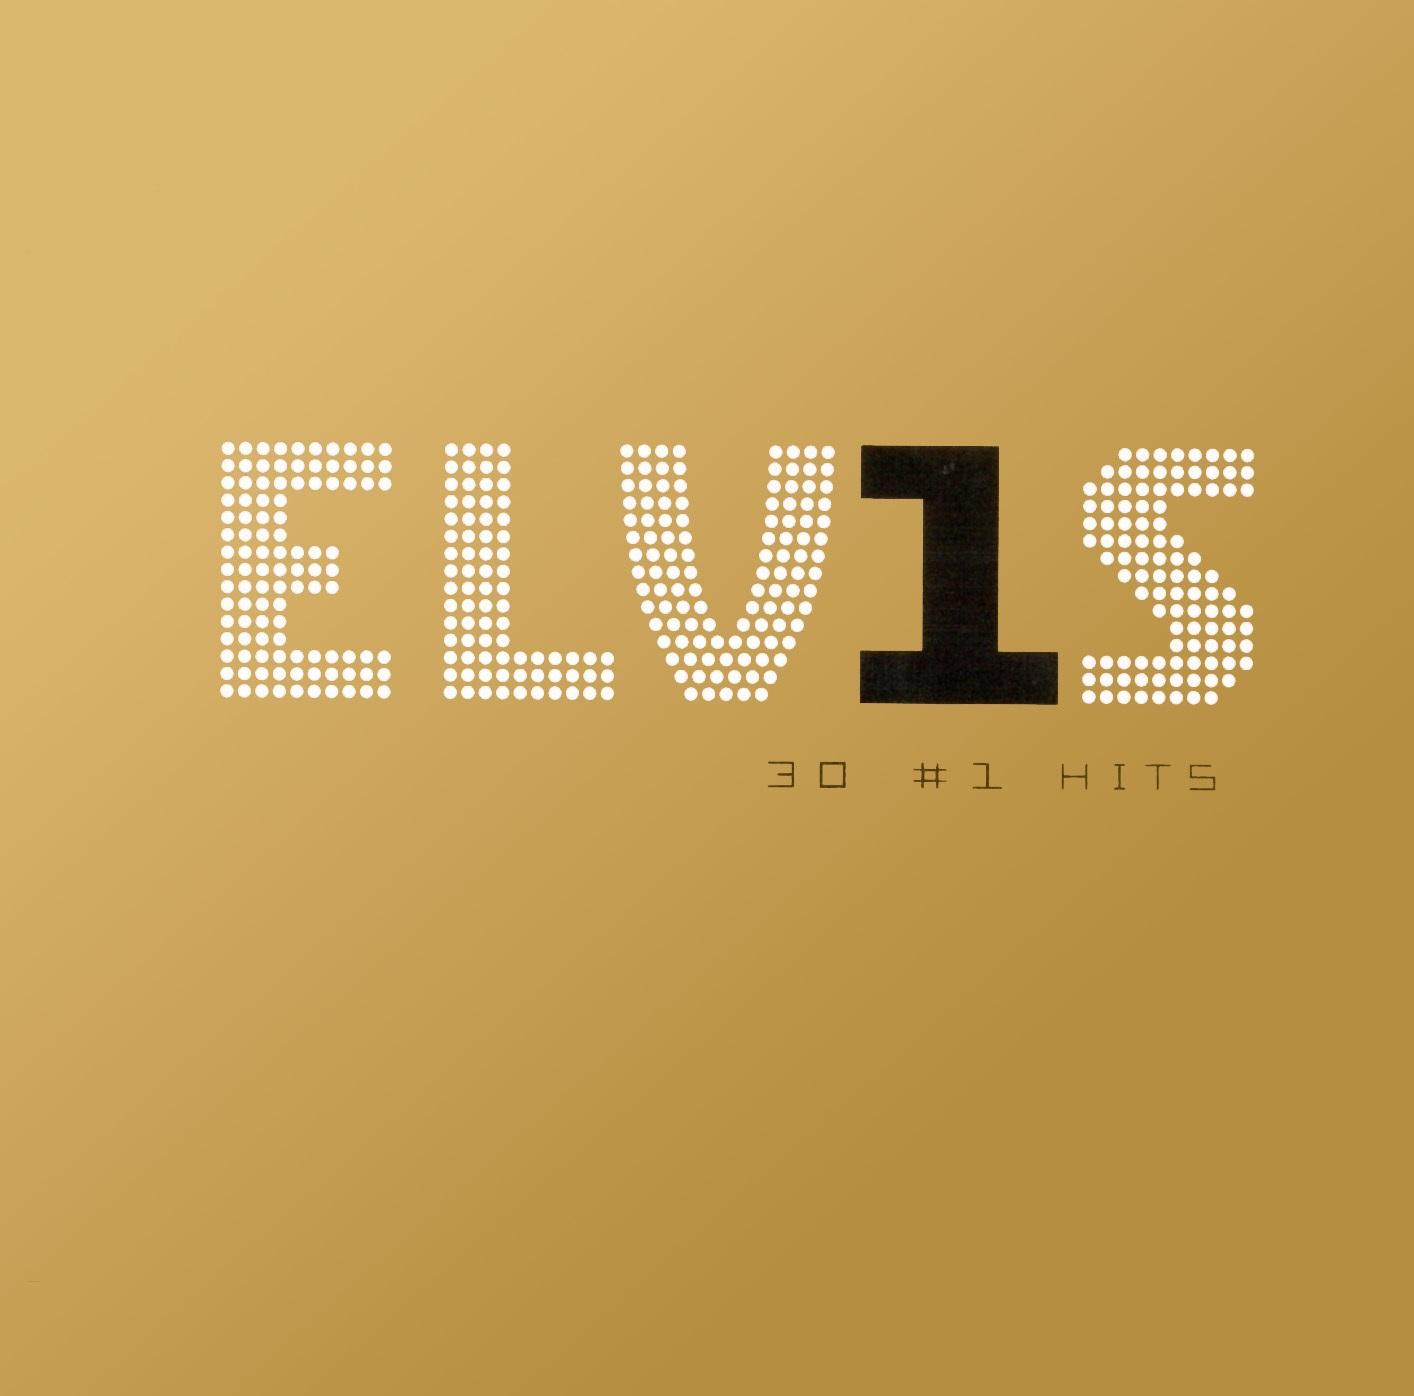 Elvis Presley: 30 #1 Hits (CD) виниловые пластинки elvis presley elvis gold the original hits 180 gram remastered gatefold